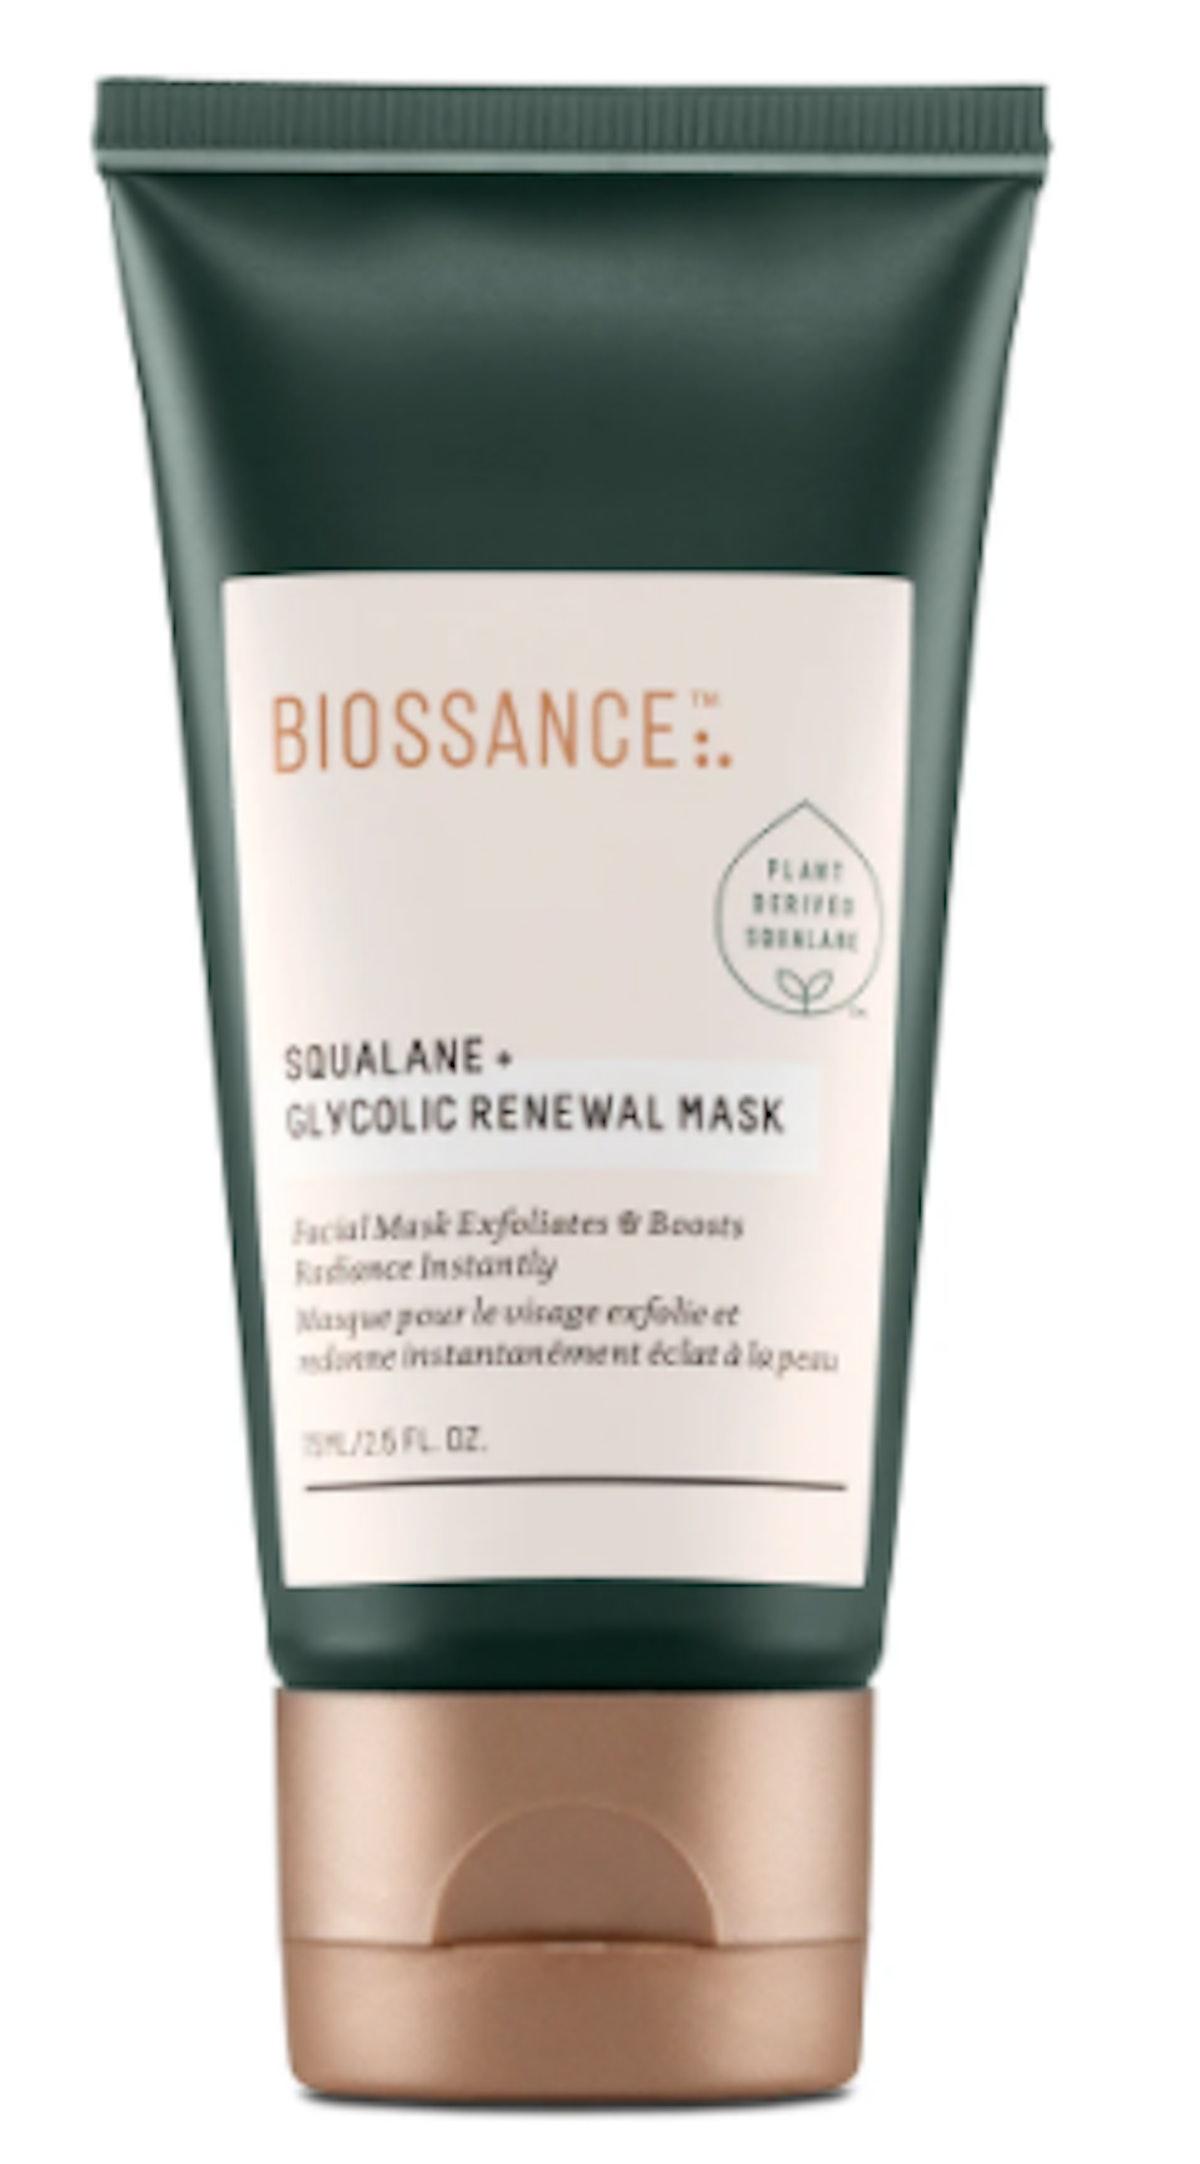 Squalane + Glycolic Renewal Mask